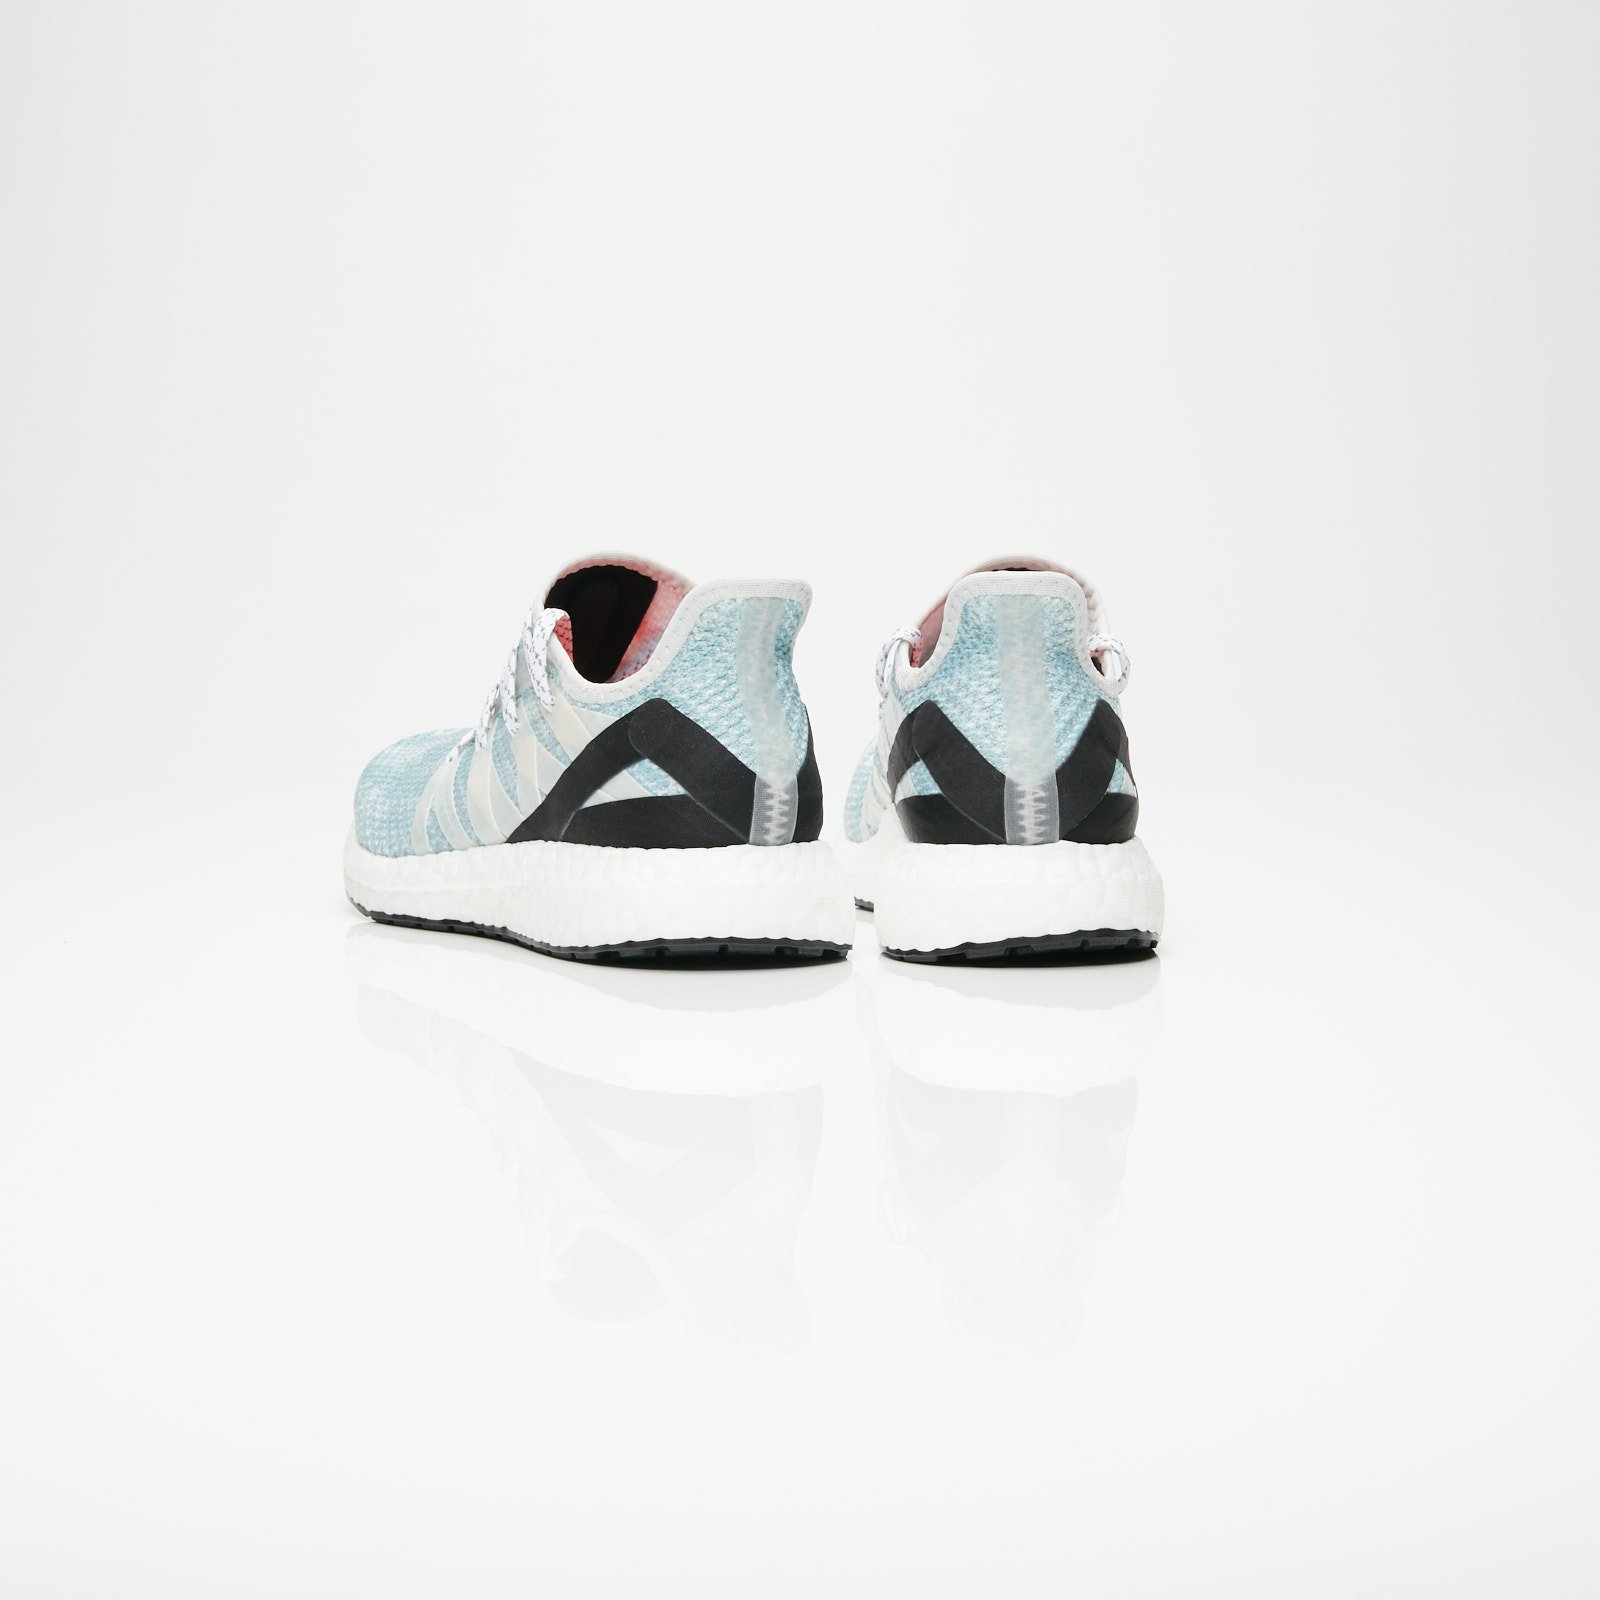 adidas SPEEDFACTORY AM4PAR G25951 Sneakersnstuff I